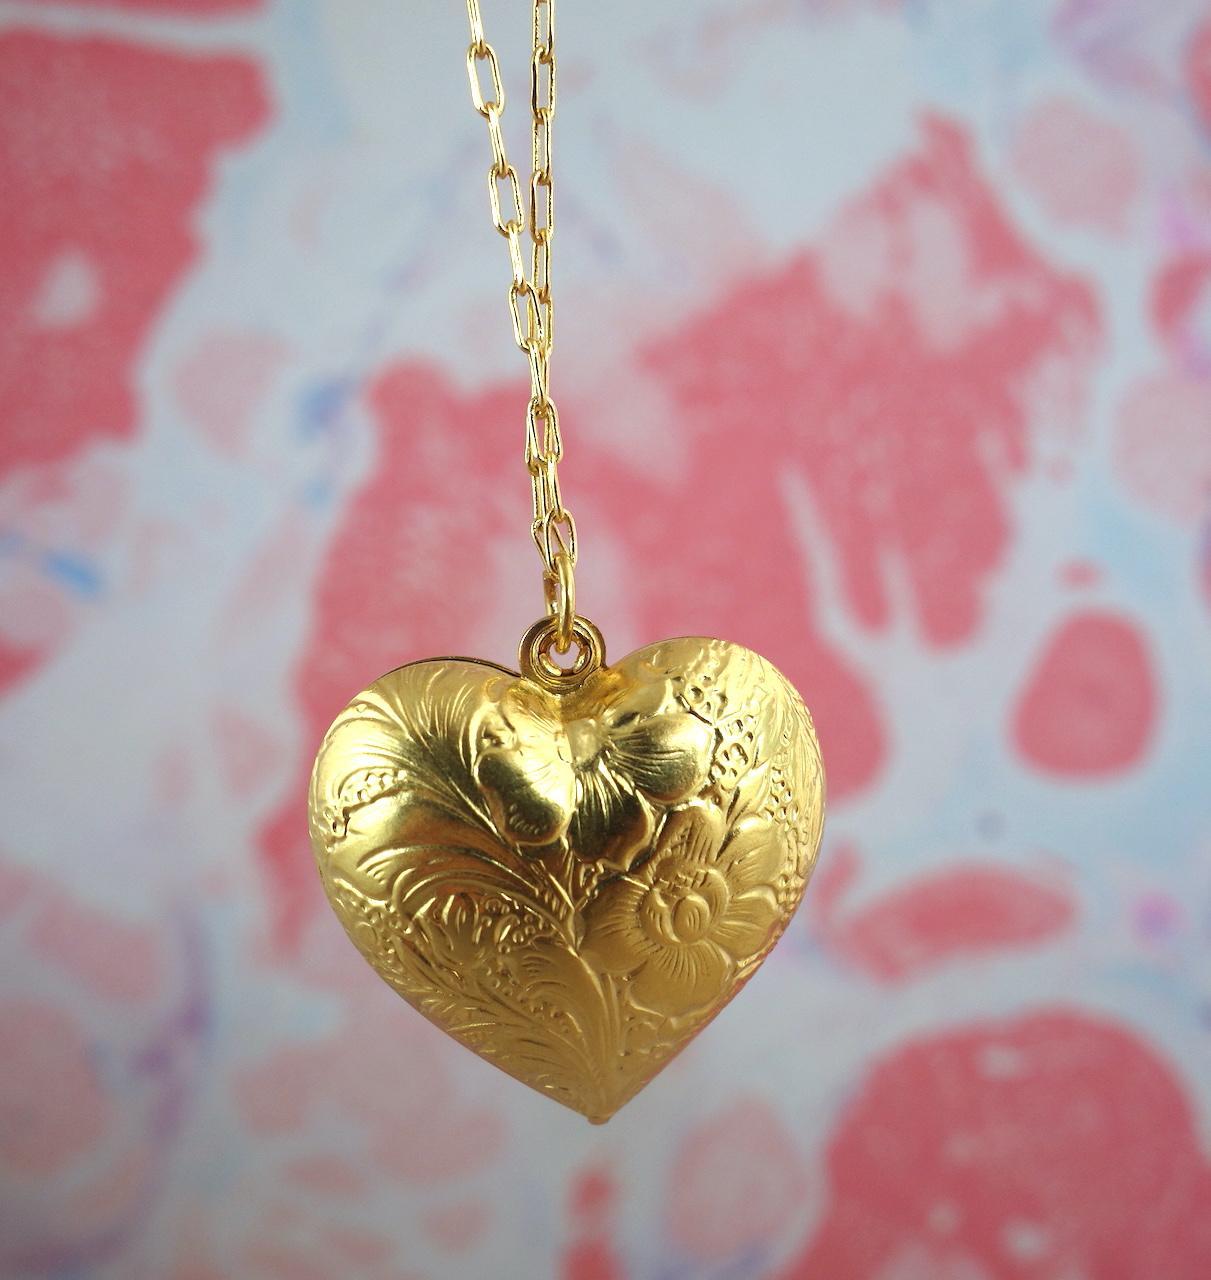 Collier-sautoir-saskia-roulotte-dore-or-fin-retro-vintage-ouvrage-amour-coeur-precieux-photo-macro.